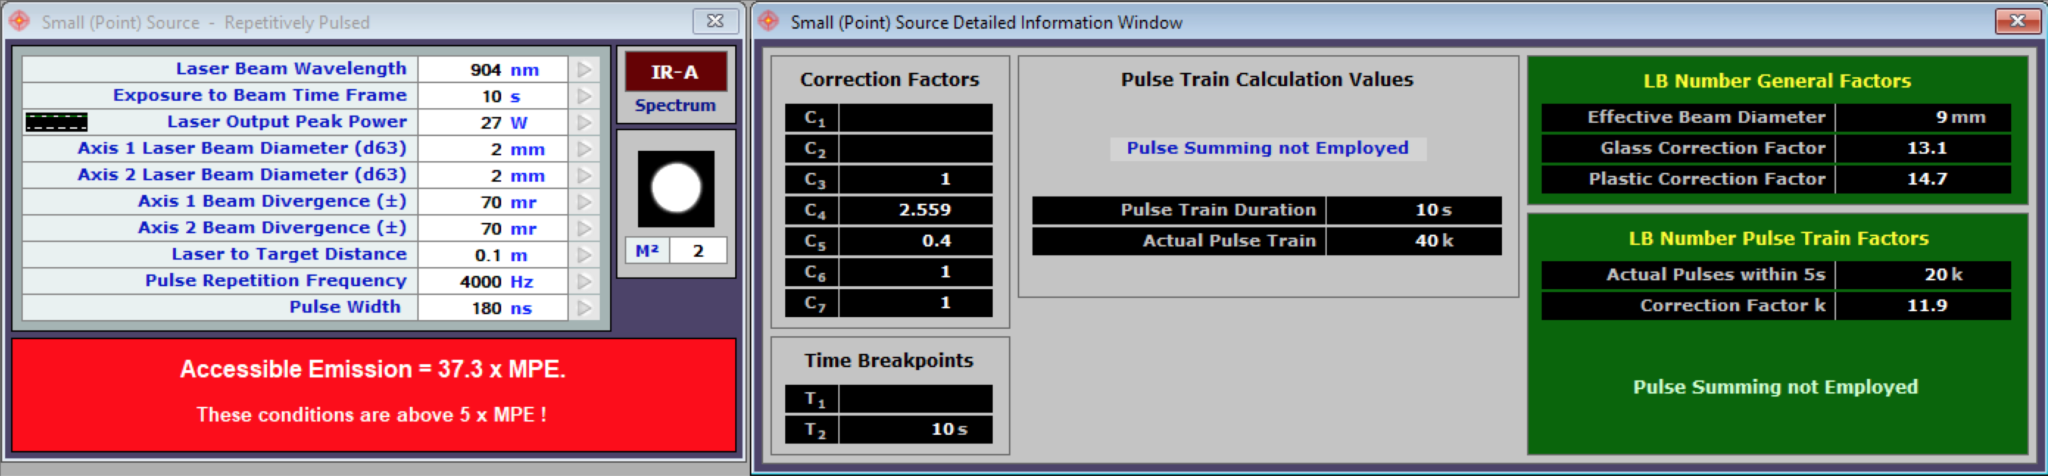 In-Depth Calculation Detail